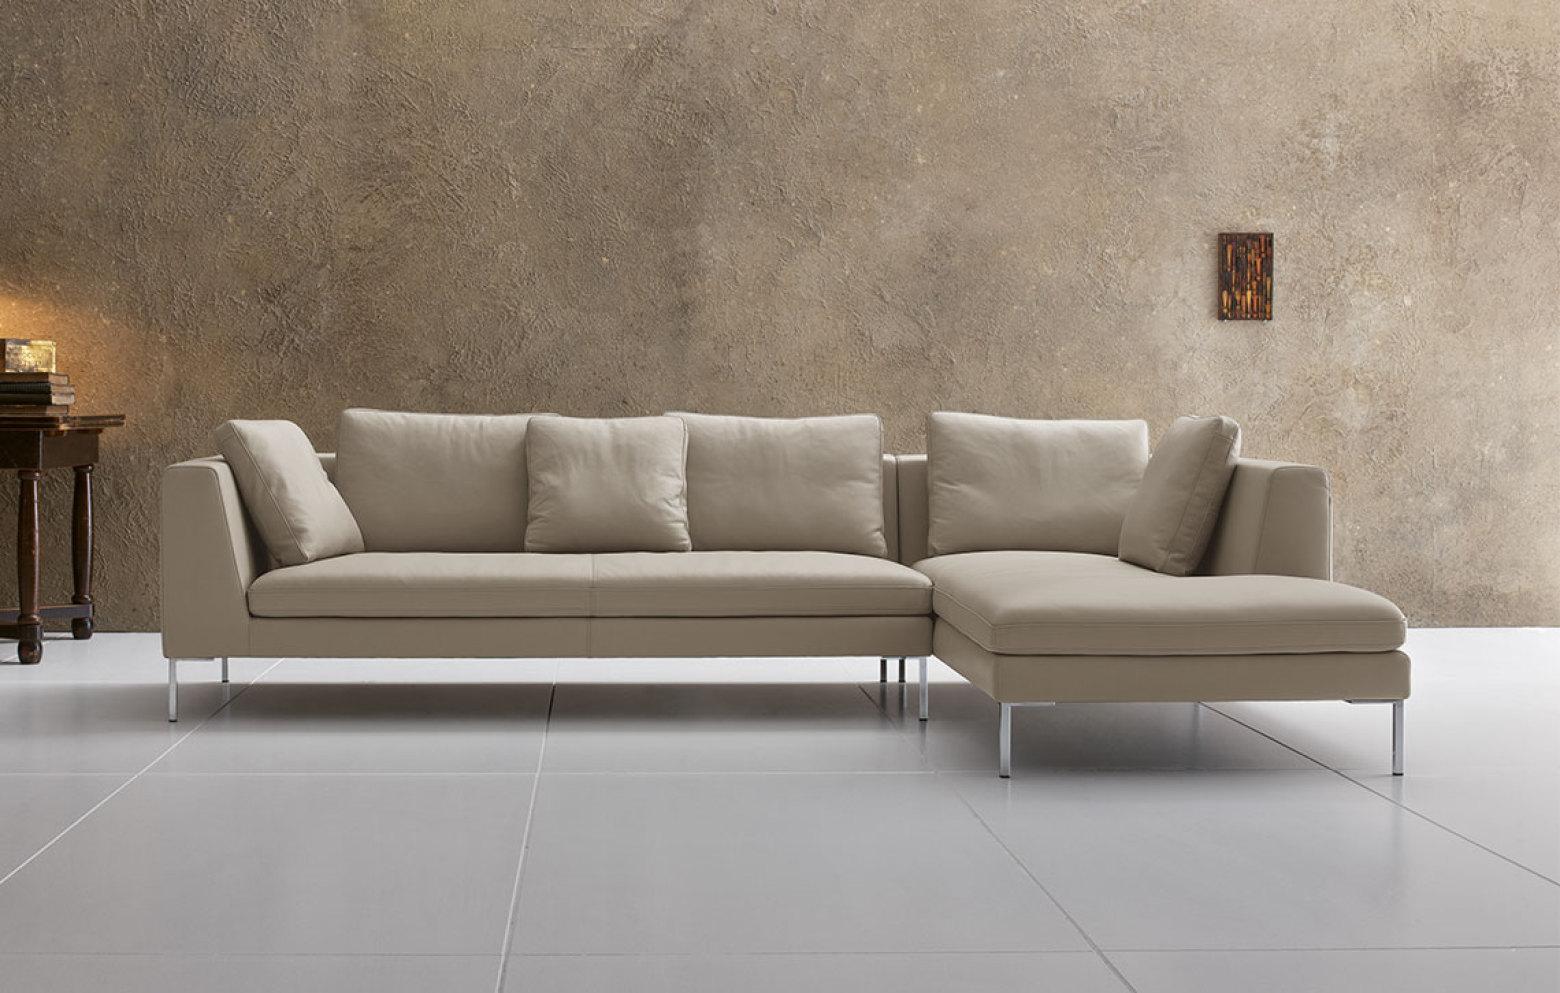 design ideen und inspiration von sofa gr e sofa hohe r ckenlehne sofa ideen sofa im. Black Bedroom Furniture Sets. Home Design Ideas